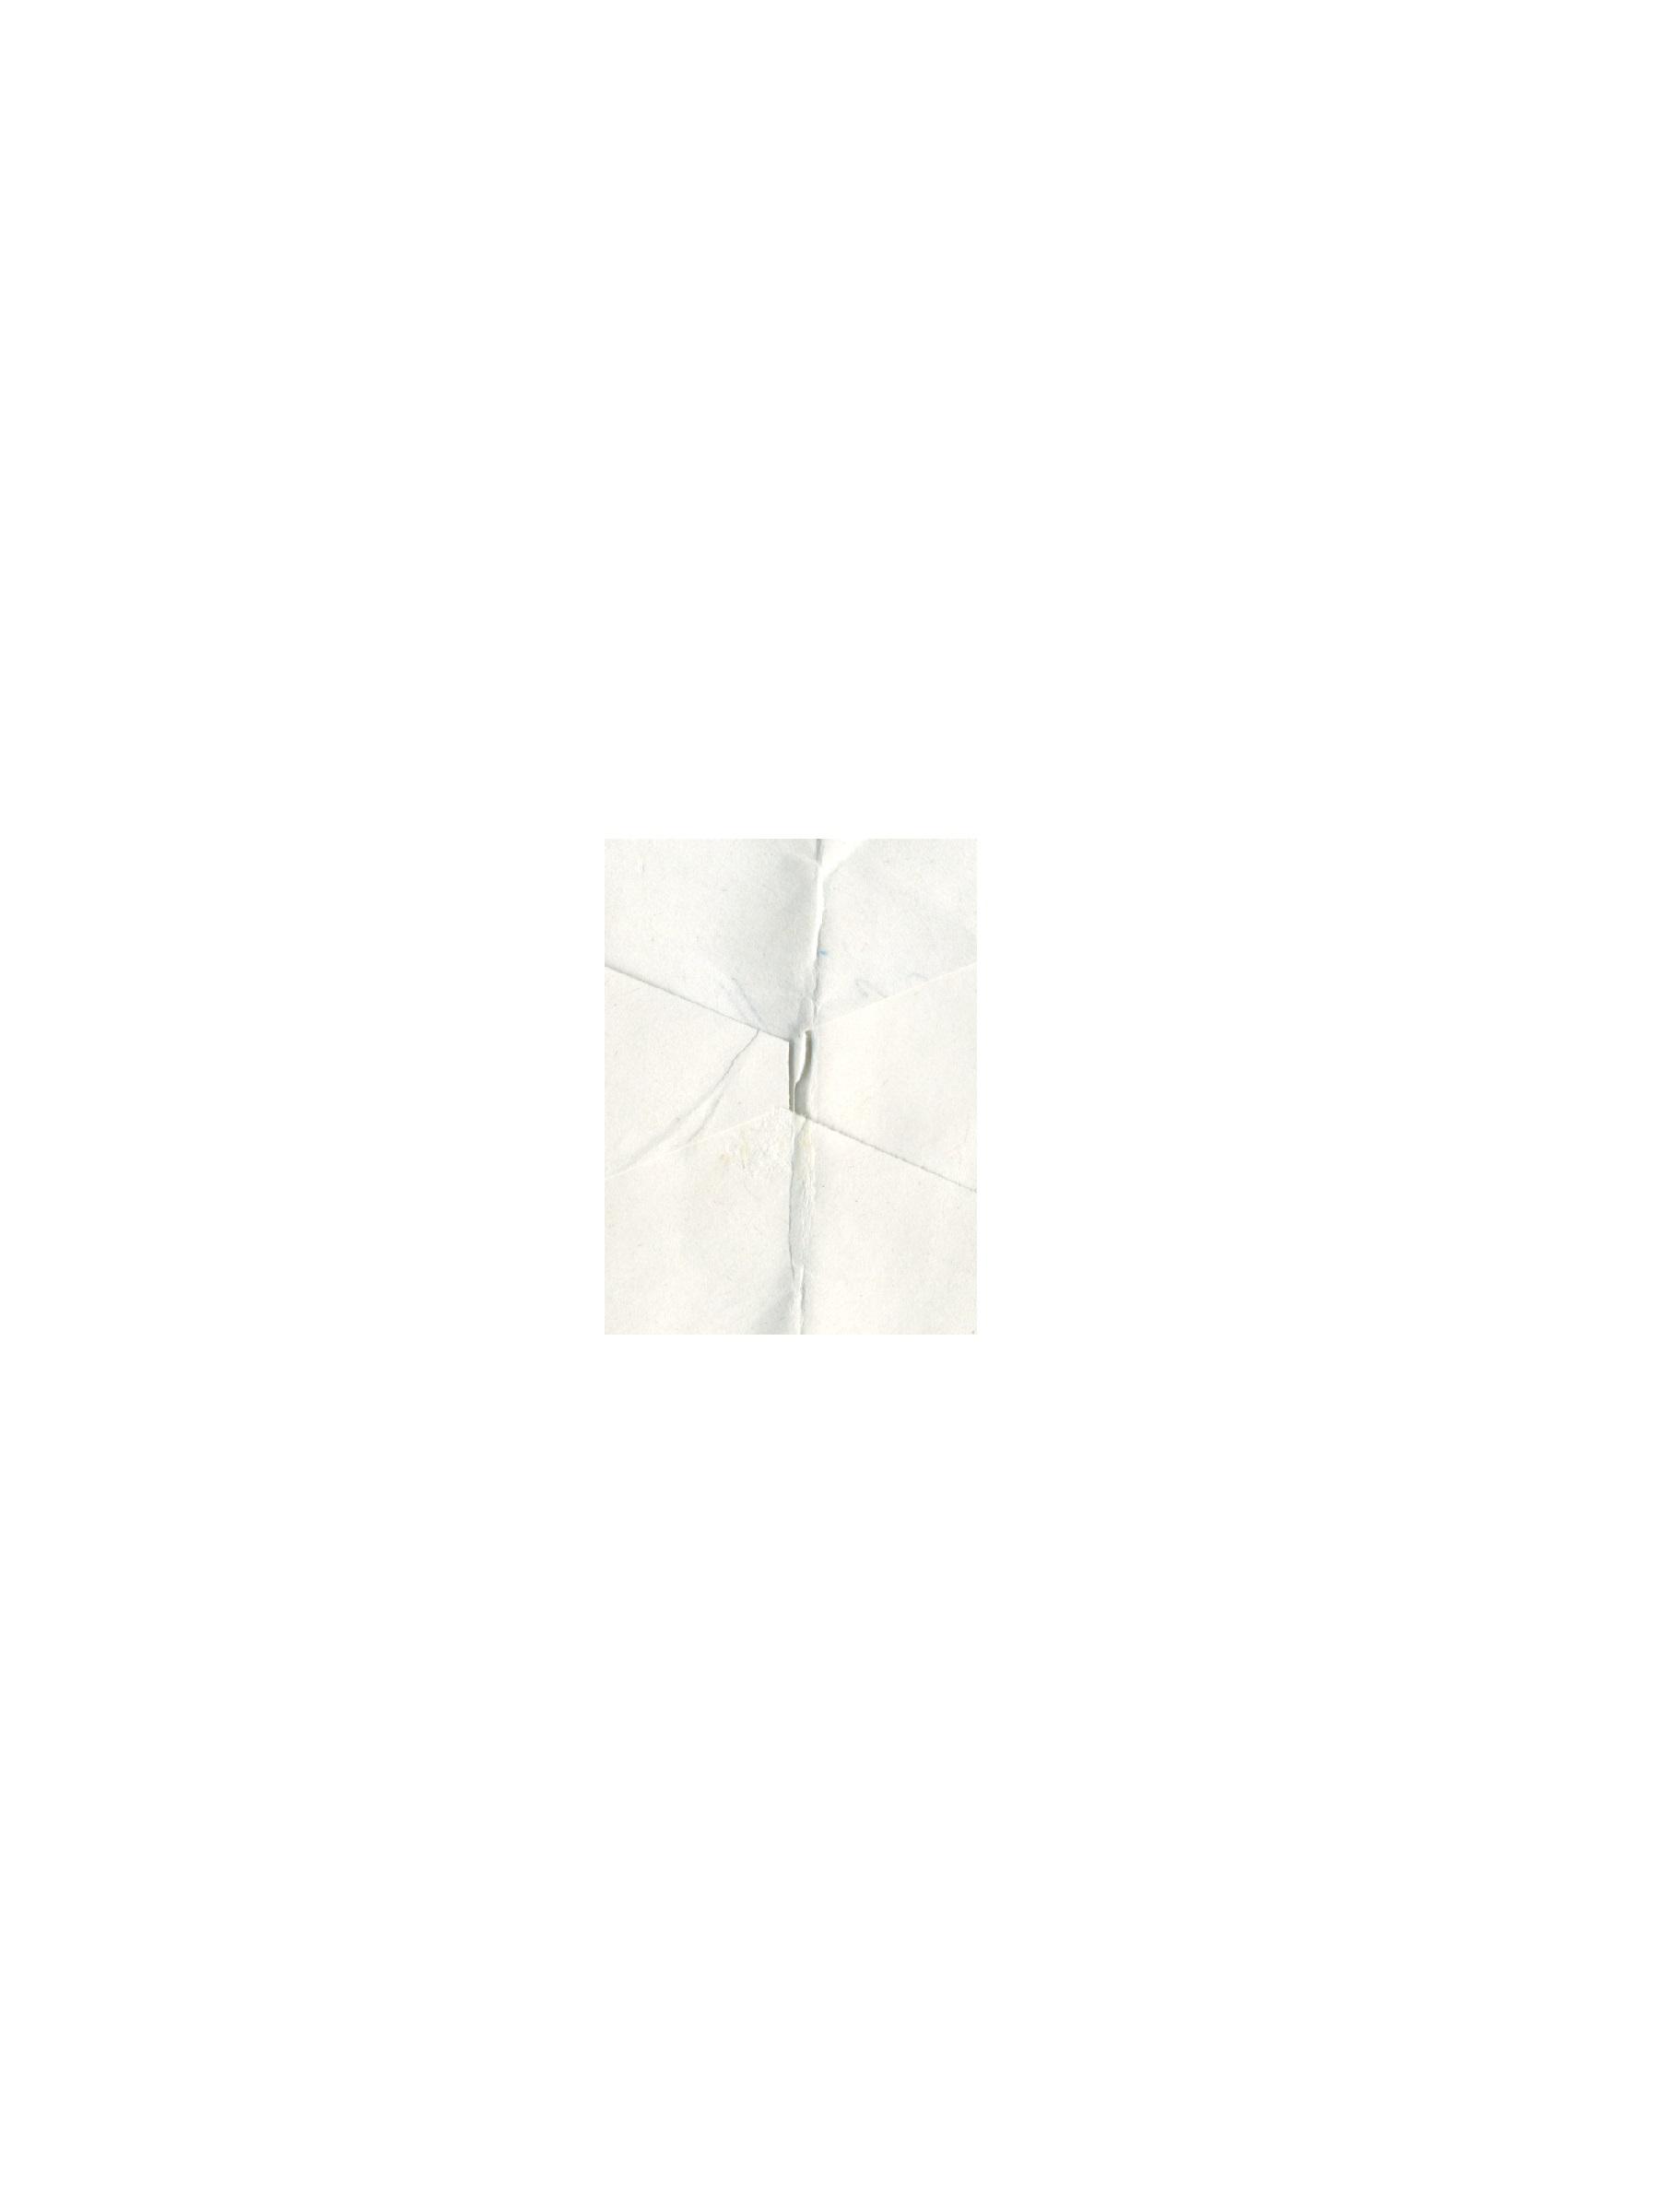 Envelope 3